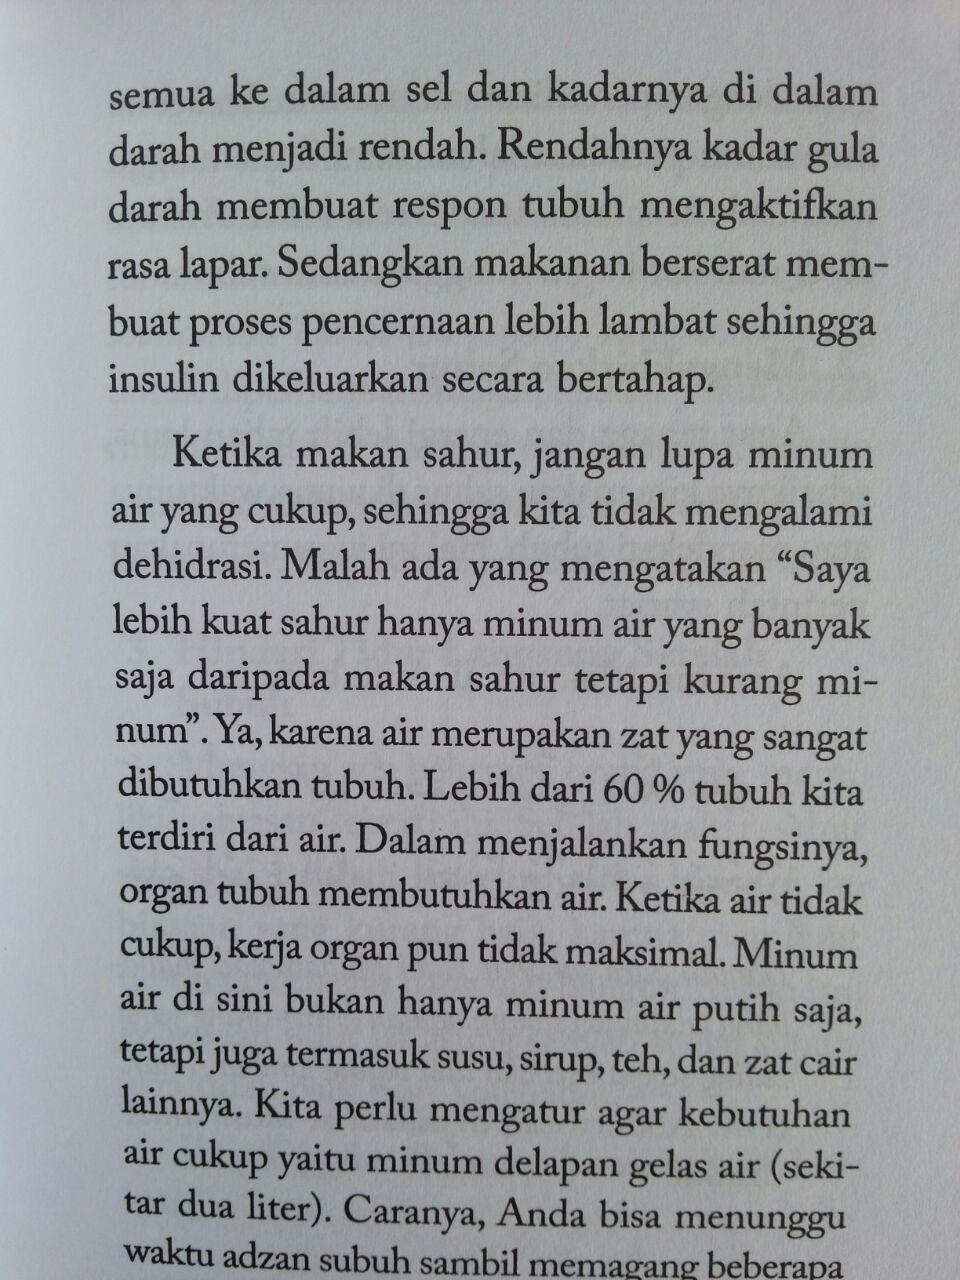 Buku Saku Sehat Dan Sunnah Menjalani Ramadhan isi 3